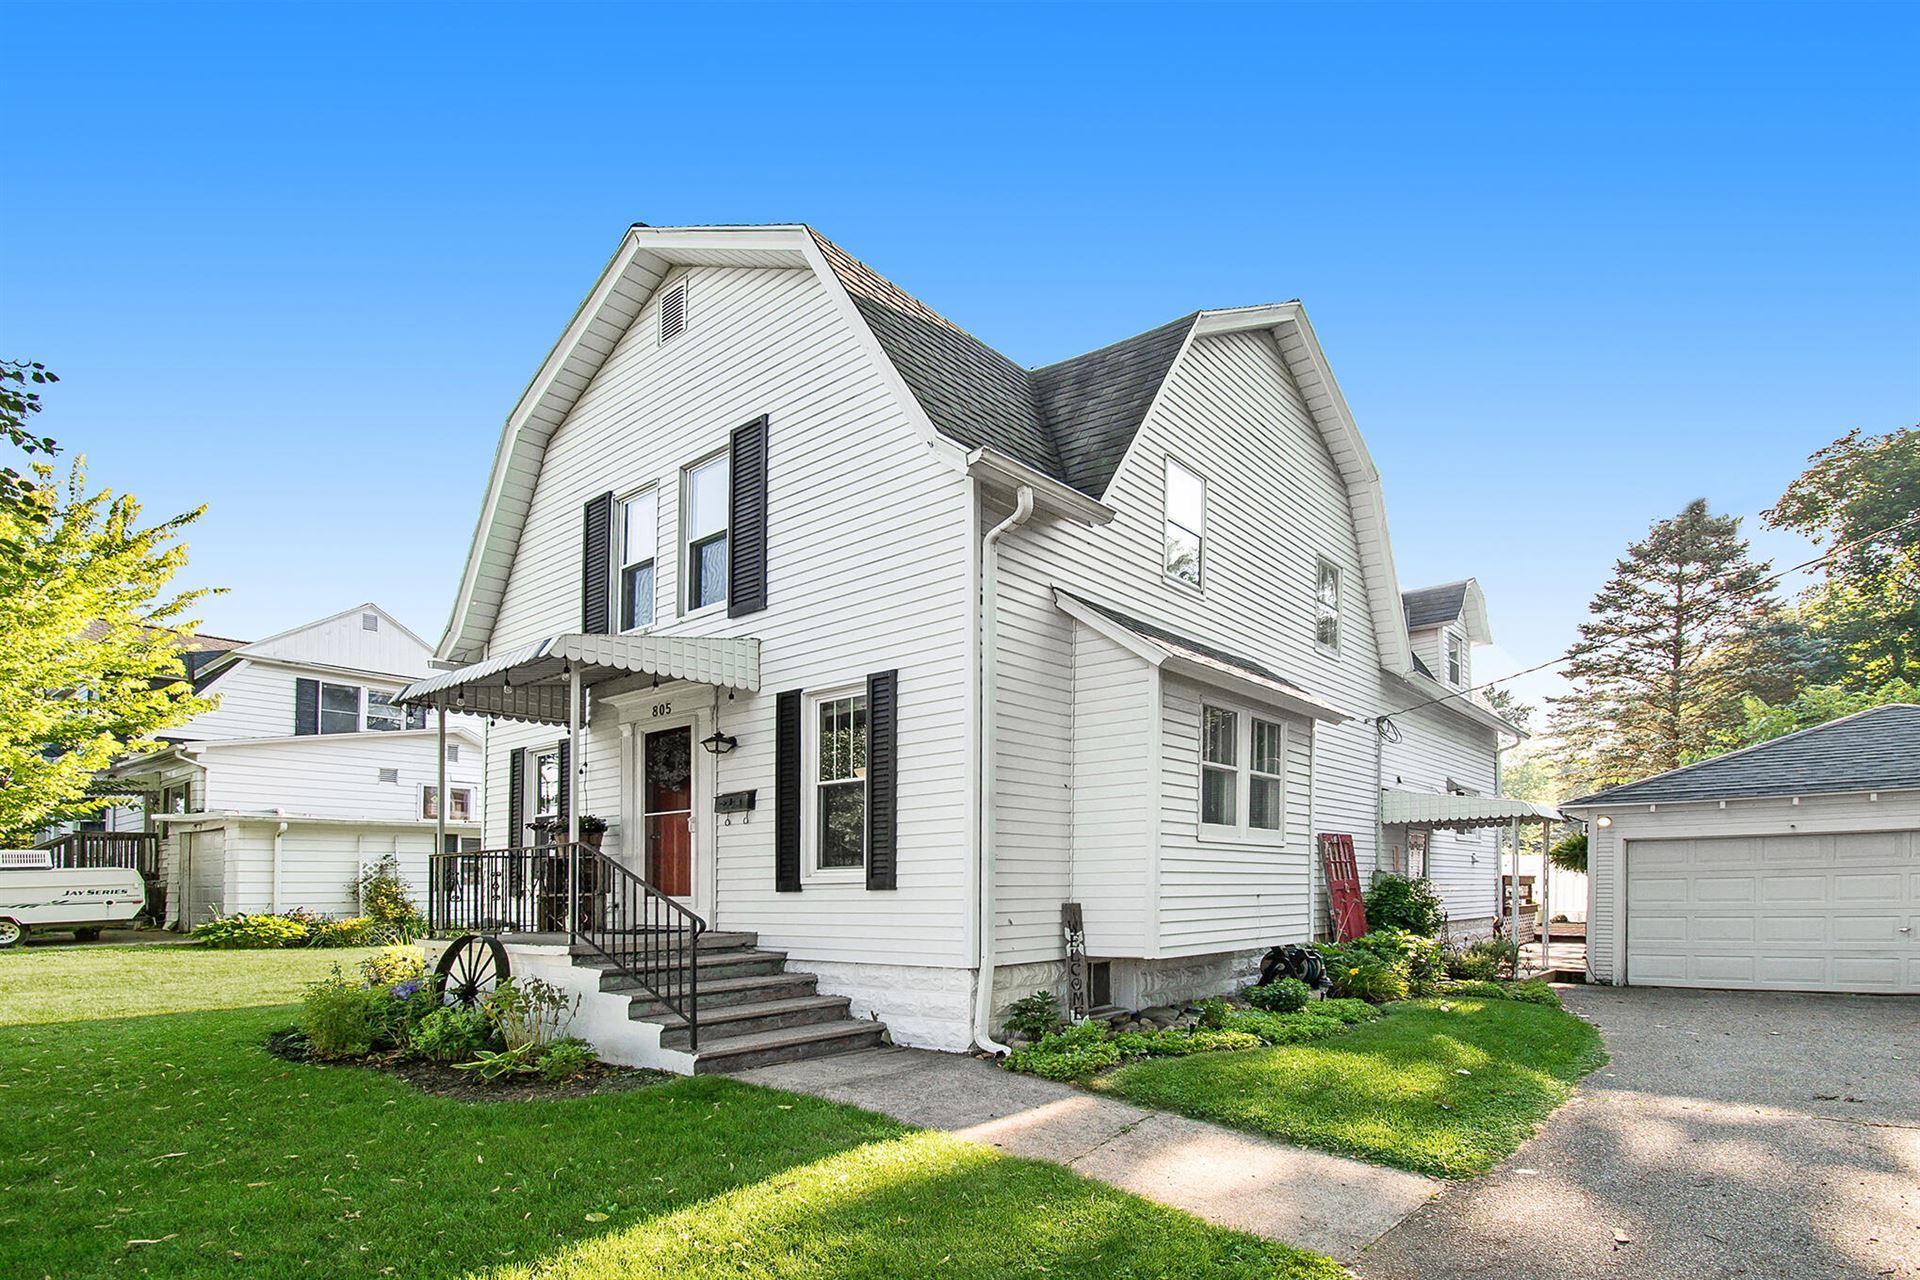 805 S Broadway Street, Hastings, MI 49058 - MLS#: 21104367